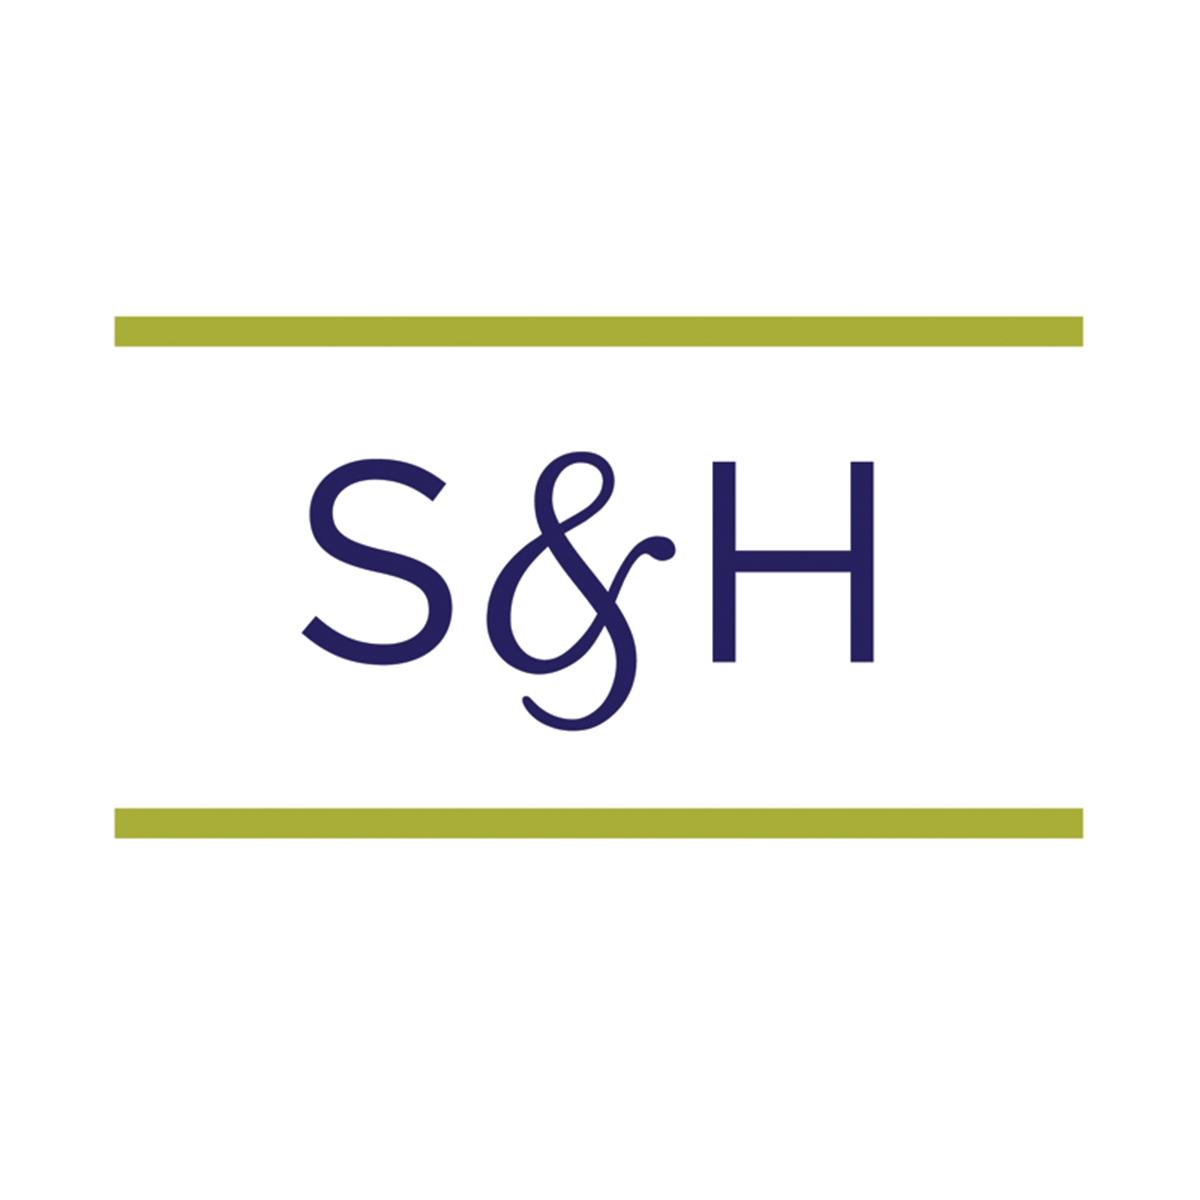 OSHA Update: OSHA's New Anti-Discrimination Requirements – What Every Human Resource Professional Needs to Know | Sherman & Howard L.L.C. - JDSupra